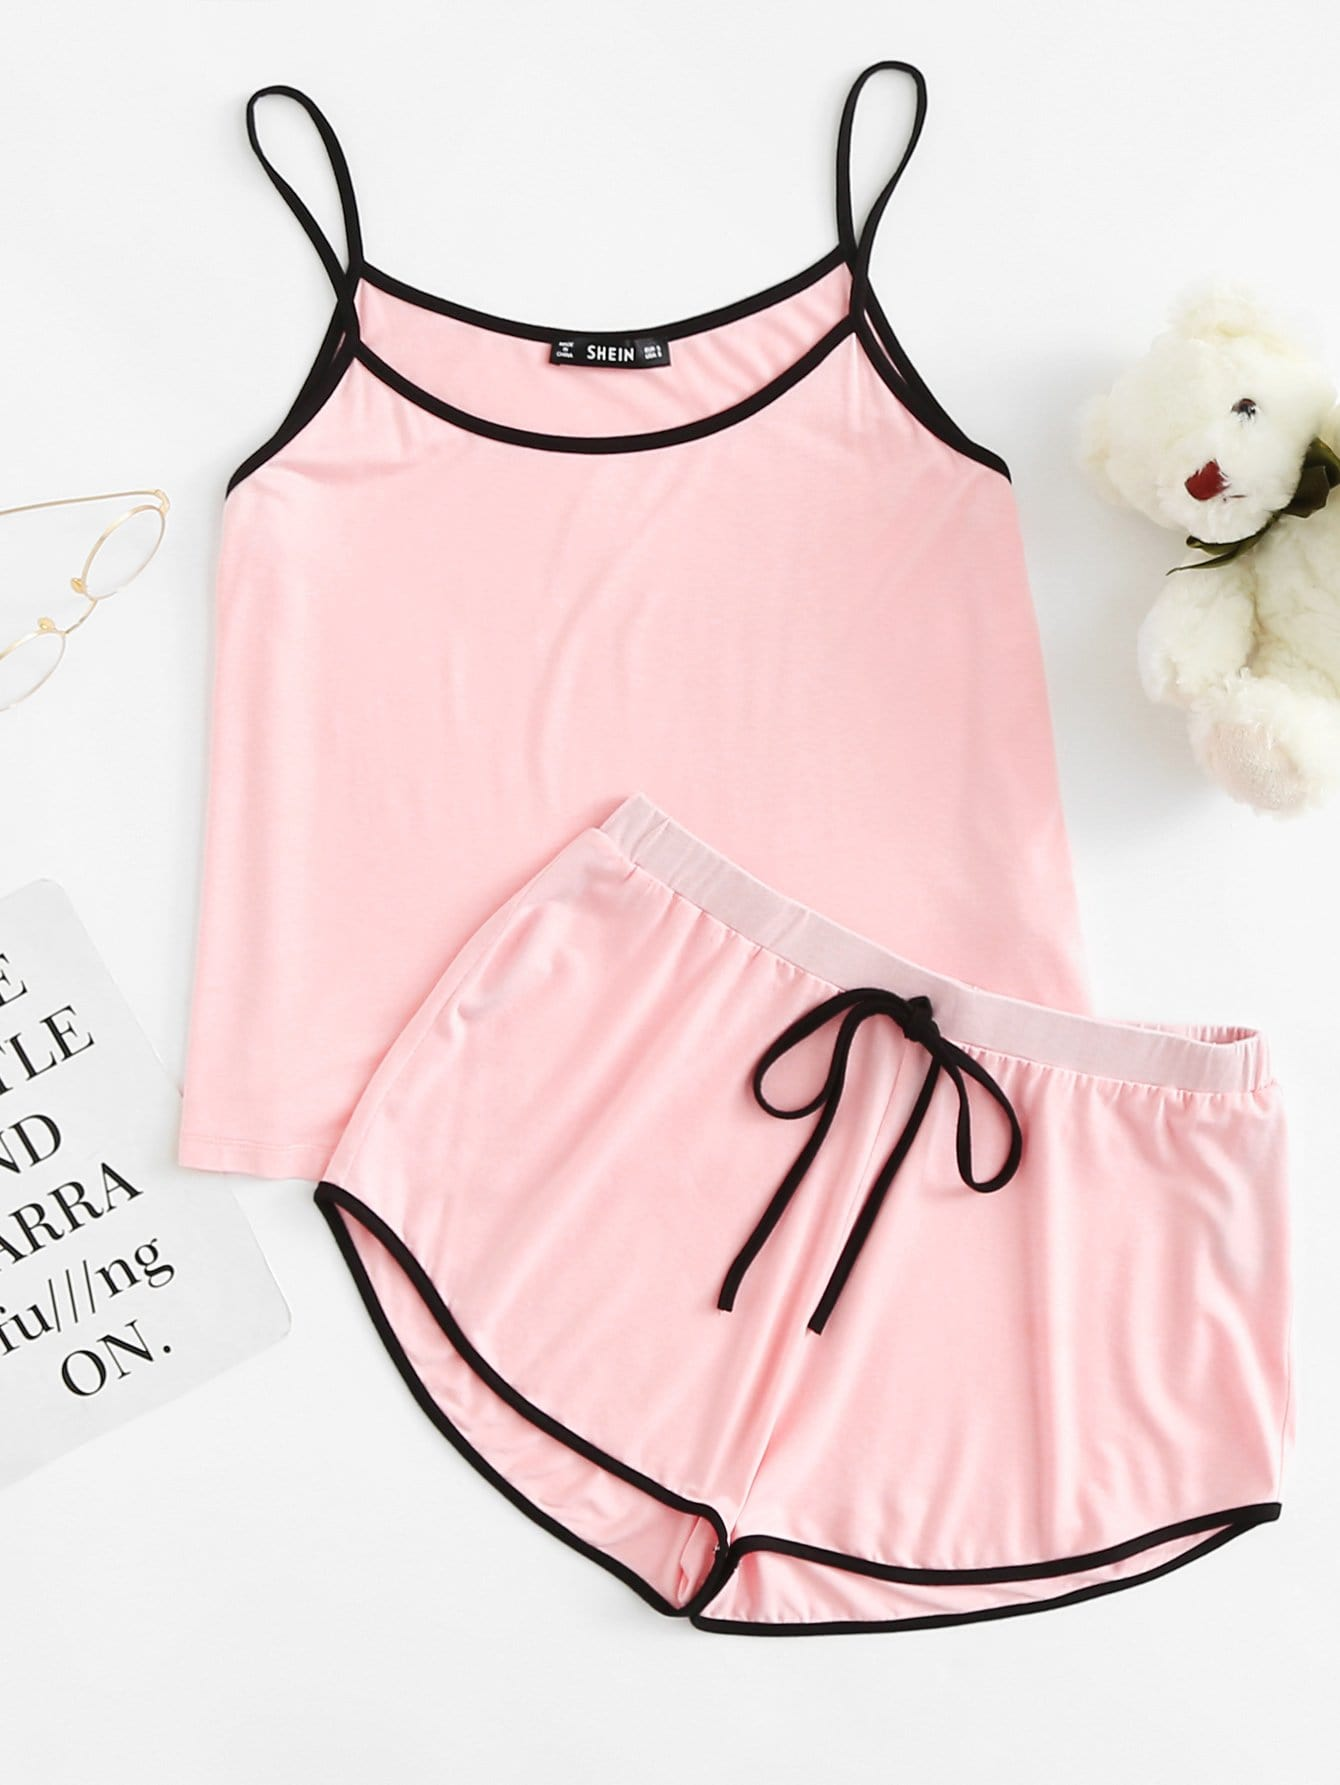 Contrast Binding Cami Top & Drawstring Waist Shorts PJ Set button decoration cami with drawstring shorts